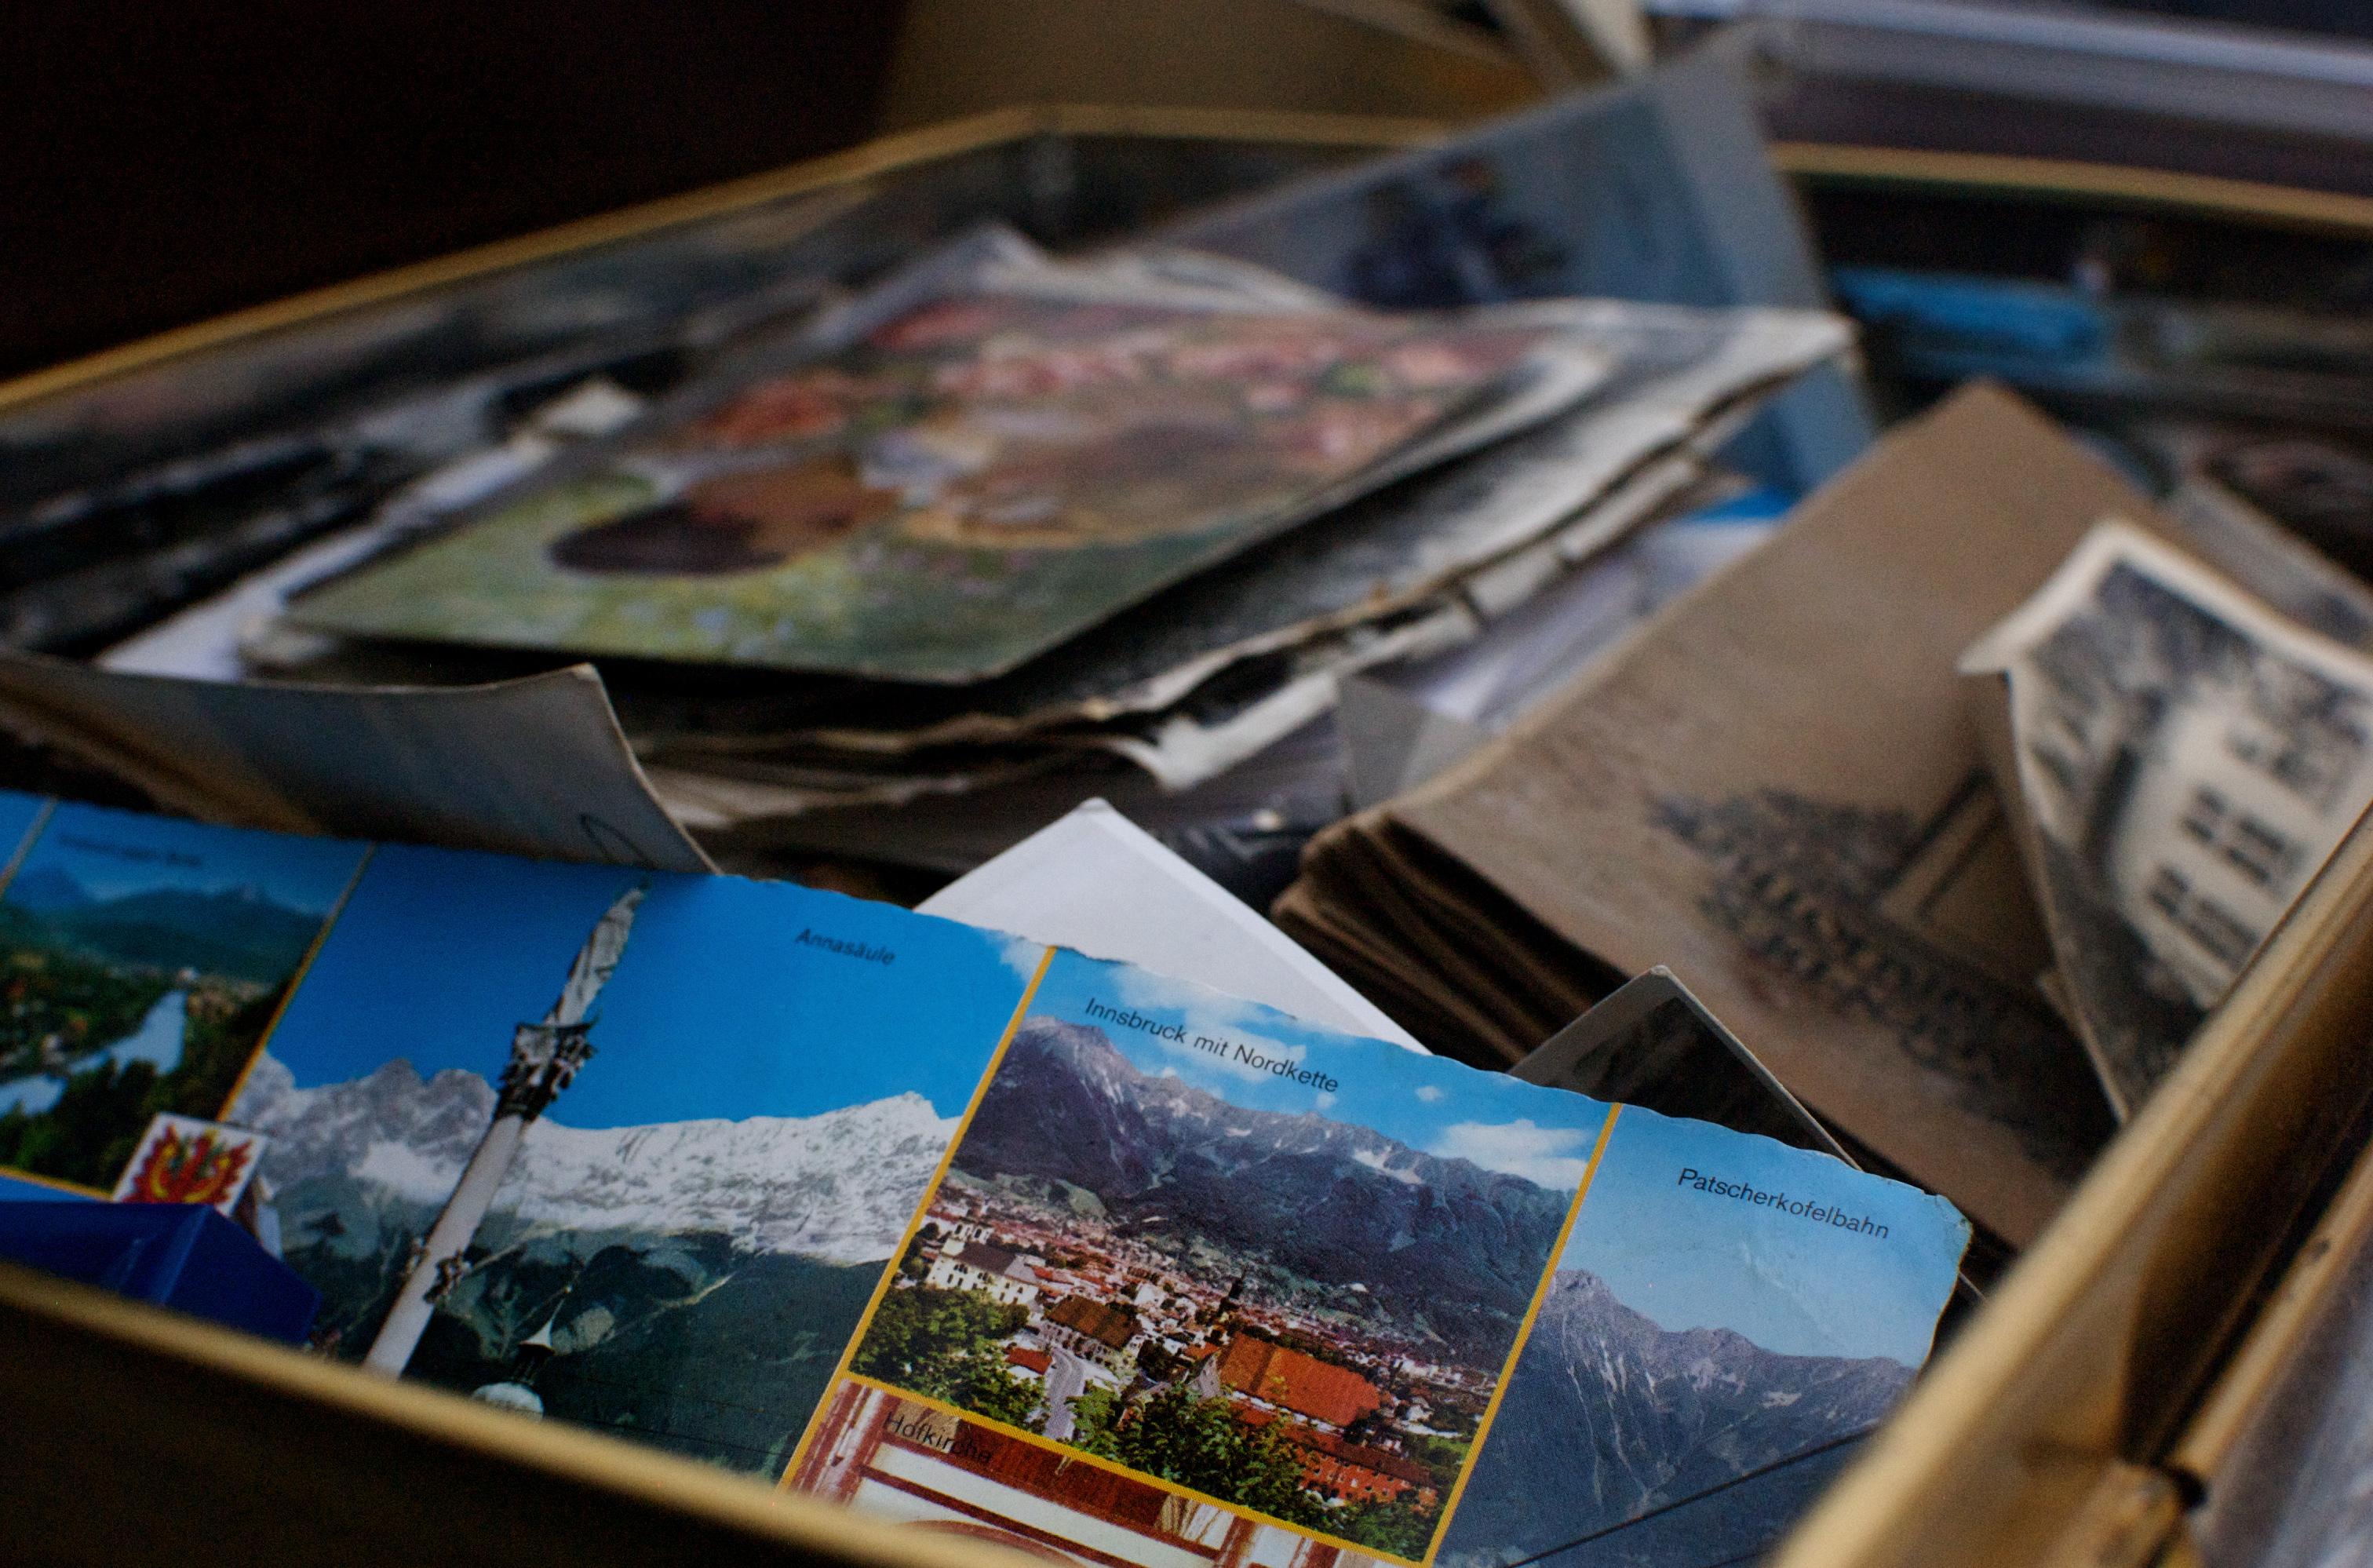 File:Box of German papers (Unsplash).jpg - Wikimedia Commons